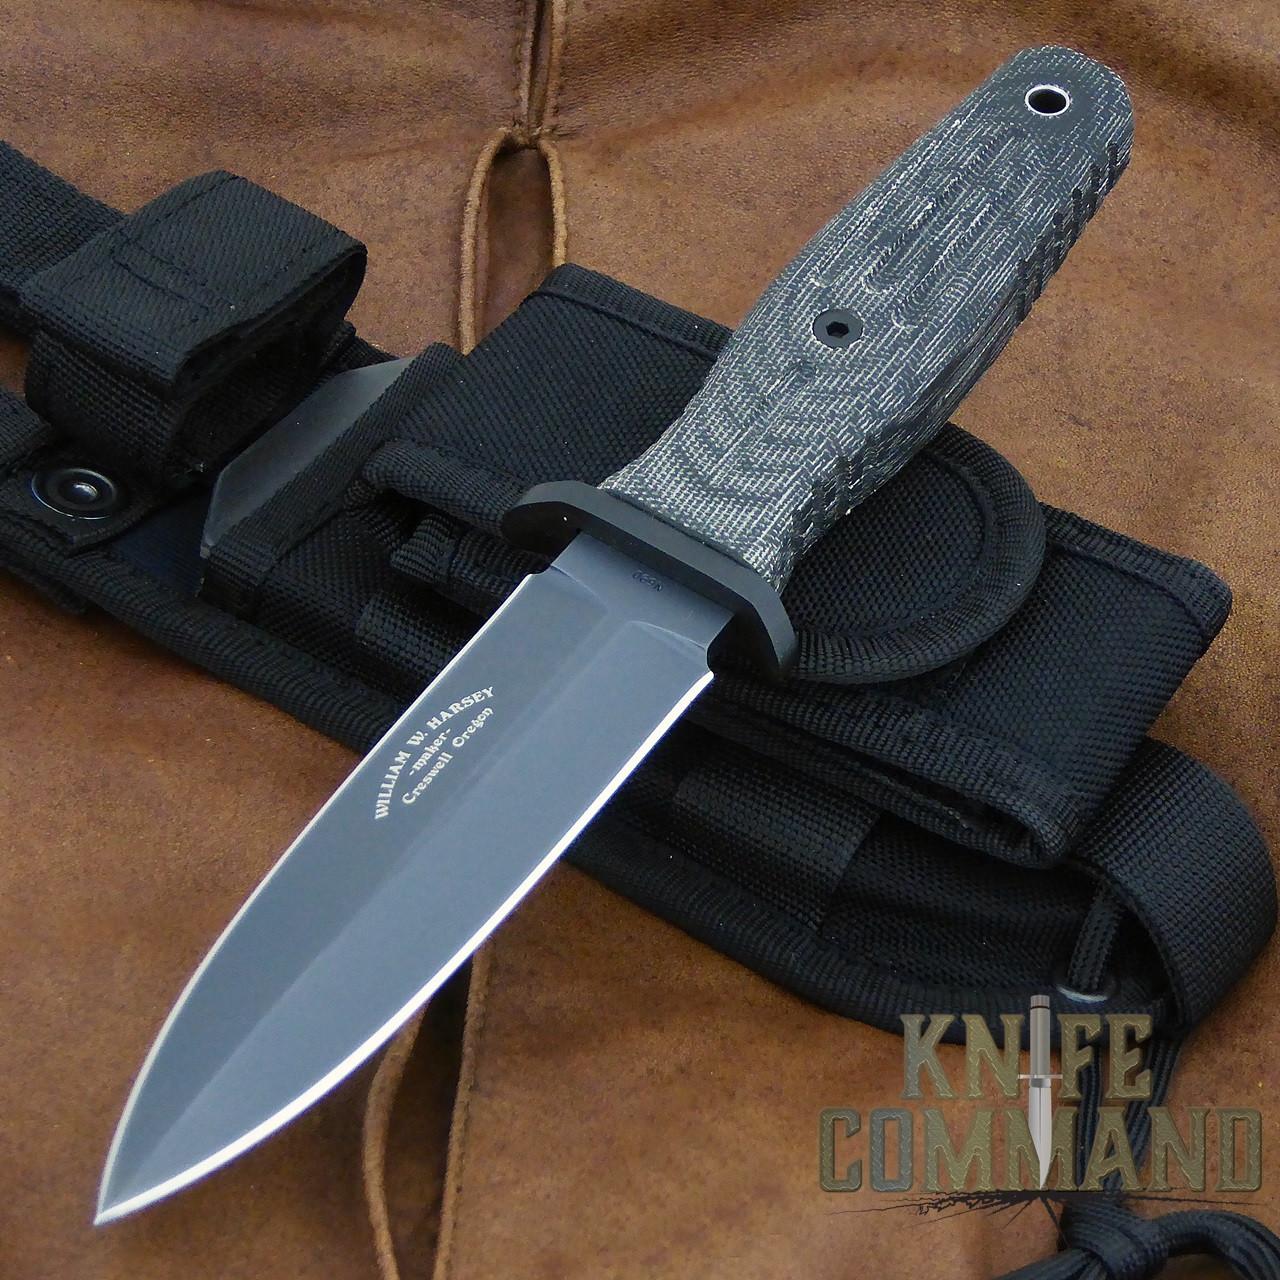 Boker Applegate-Fairbairn A-F 4.5 Black Harsey Combat Knife 121644.  Now in Tactical Black.